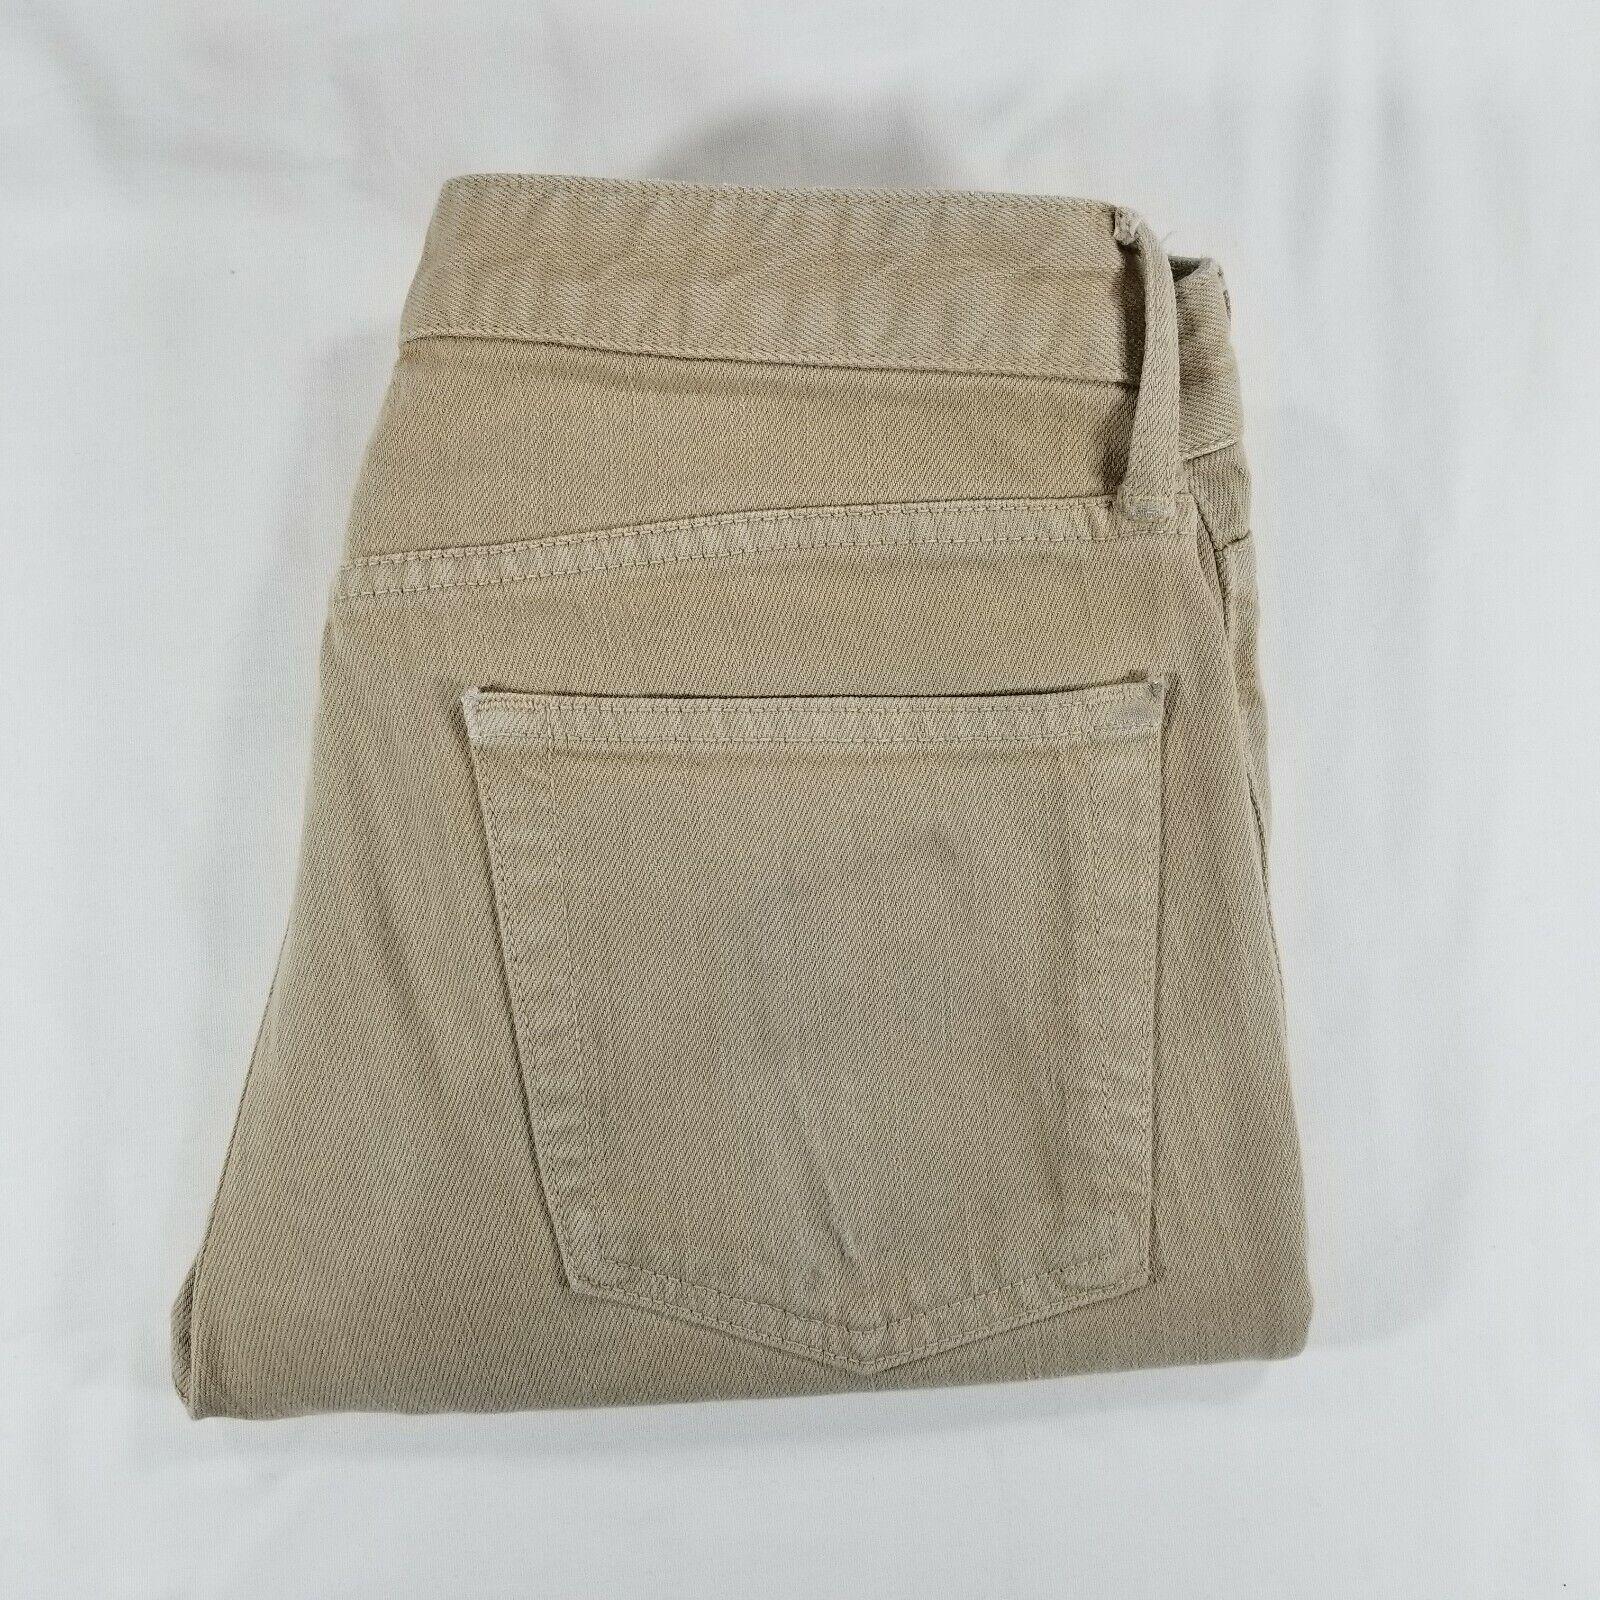 Bonobos Travel Jeans Straight Fit - Tan - 39x32